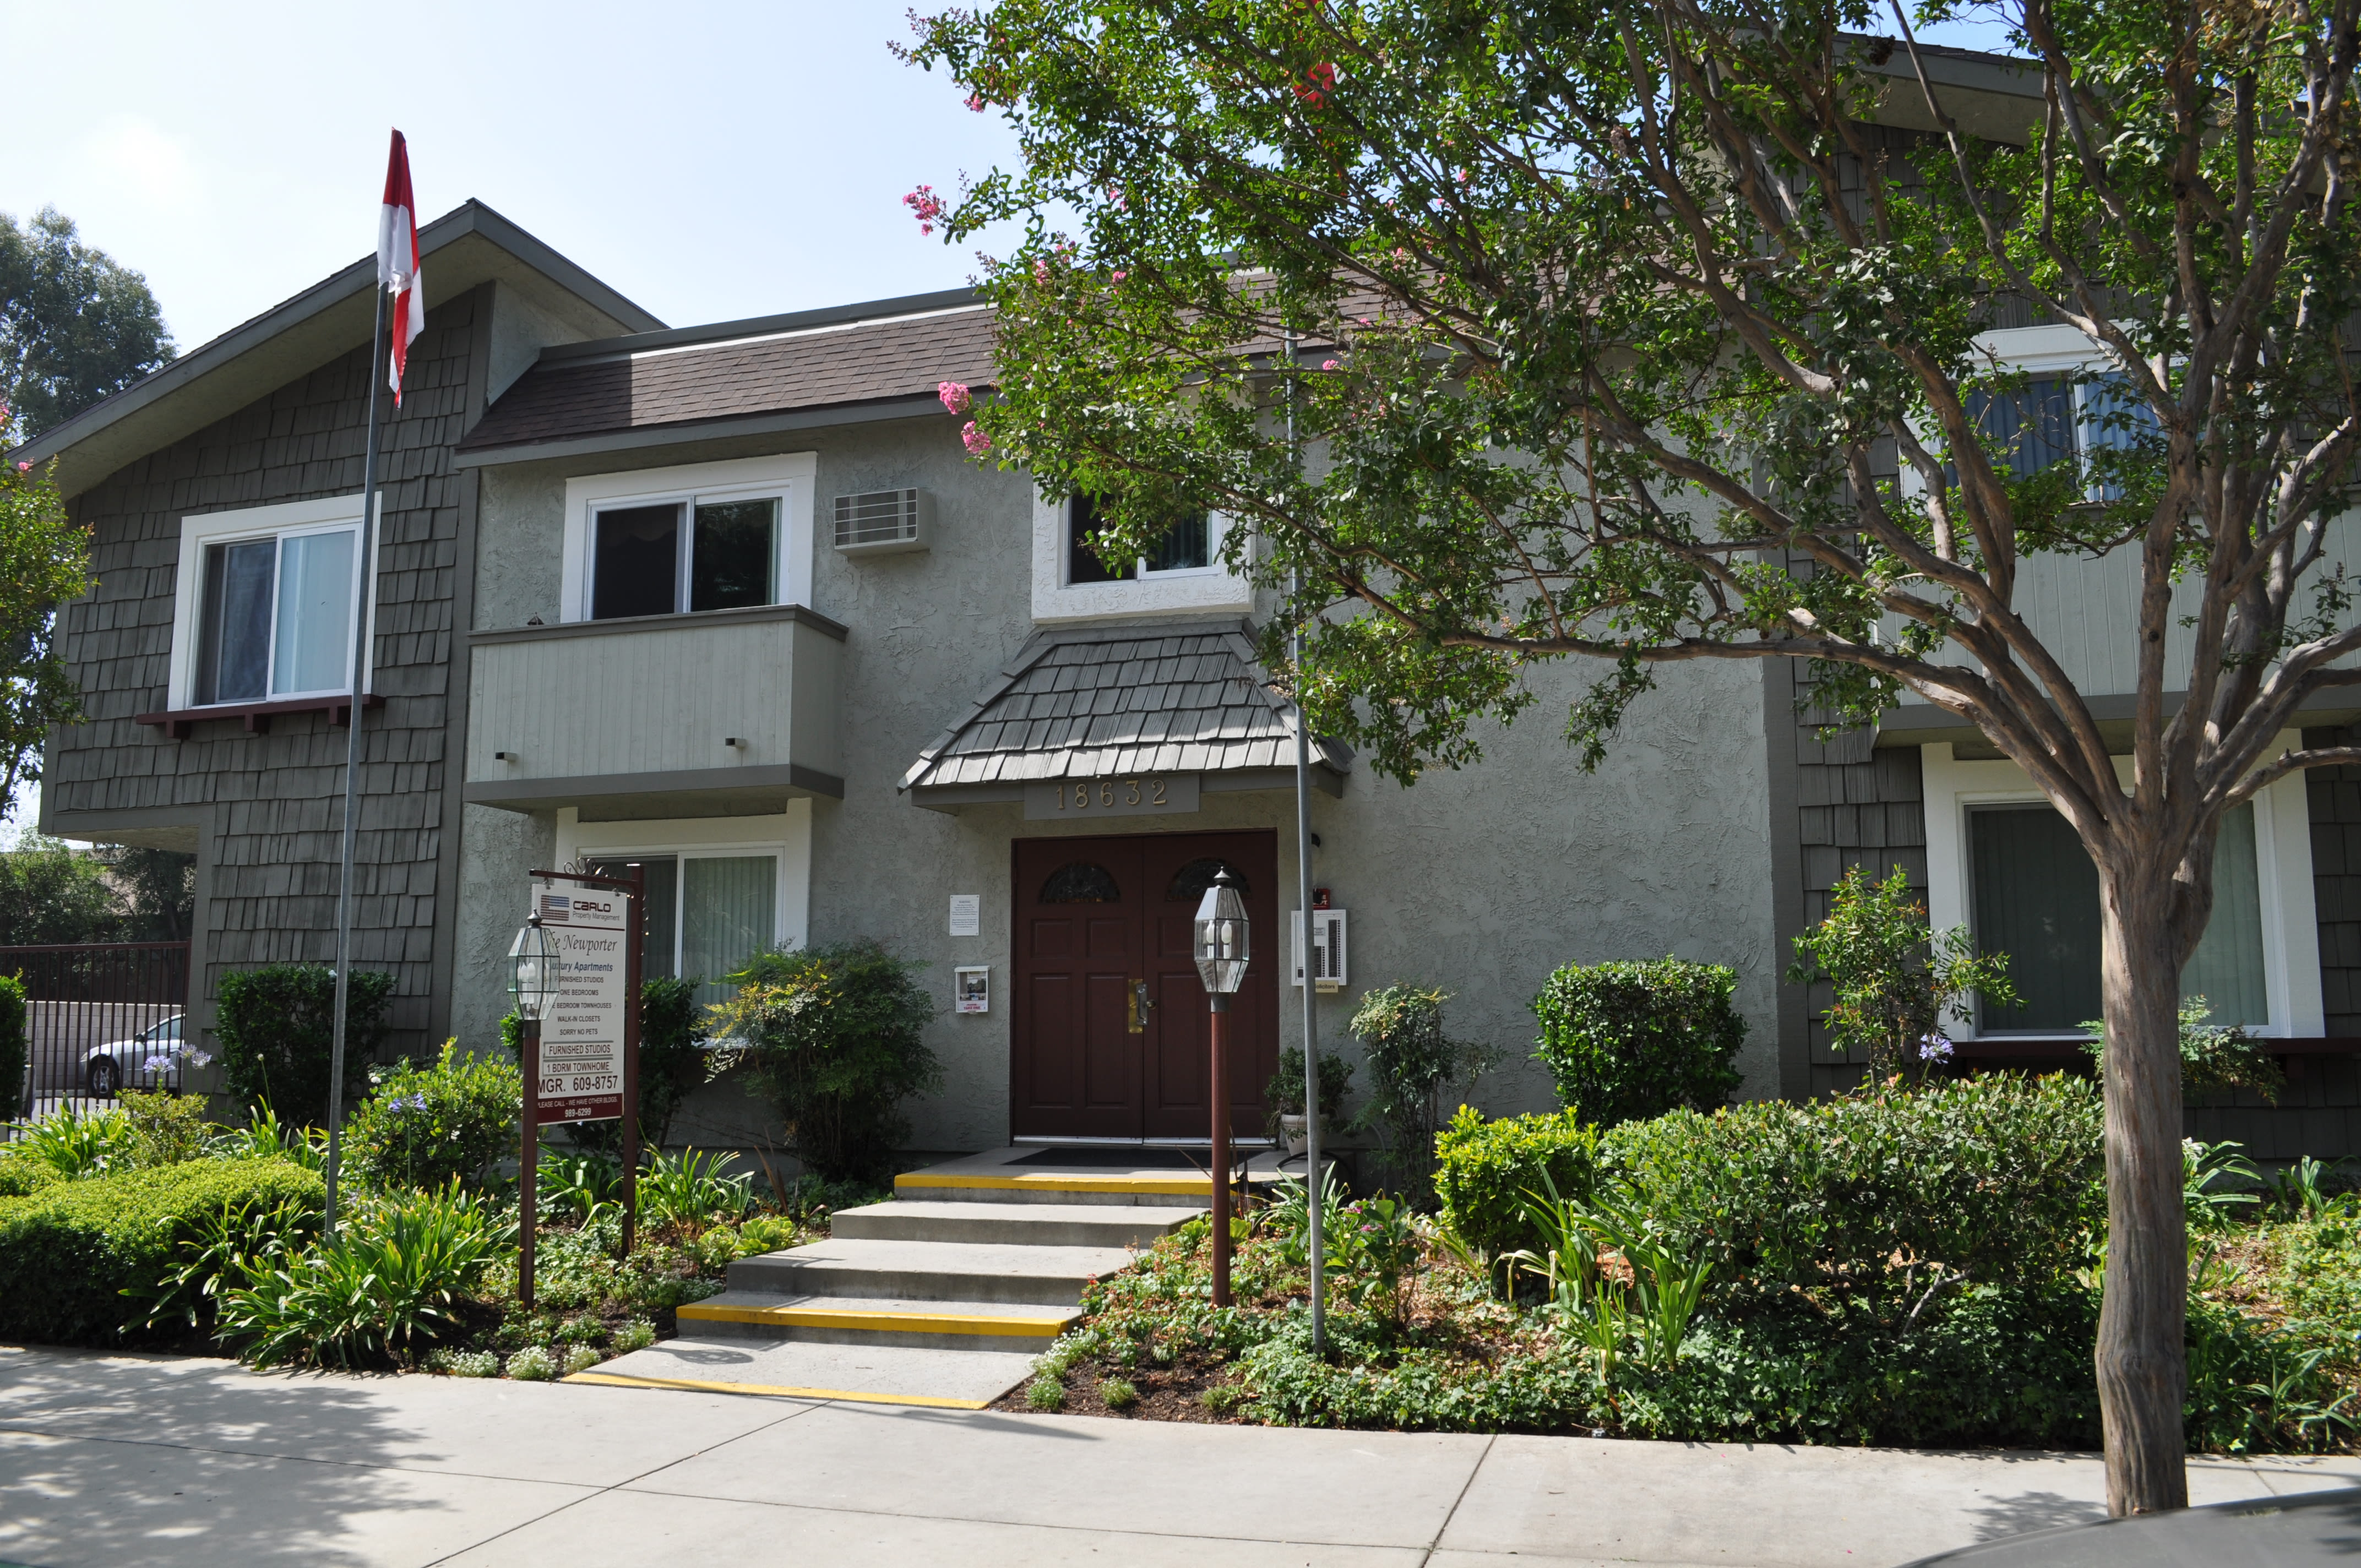 Exterior of building with entrance at The Newporter in Tarzana, California